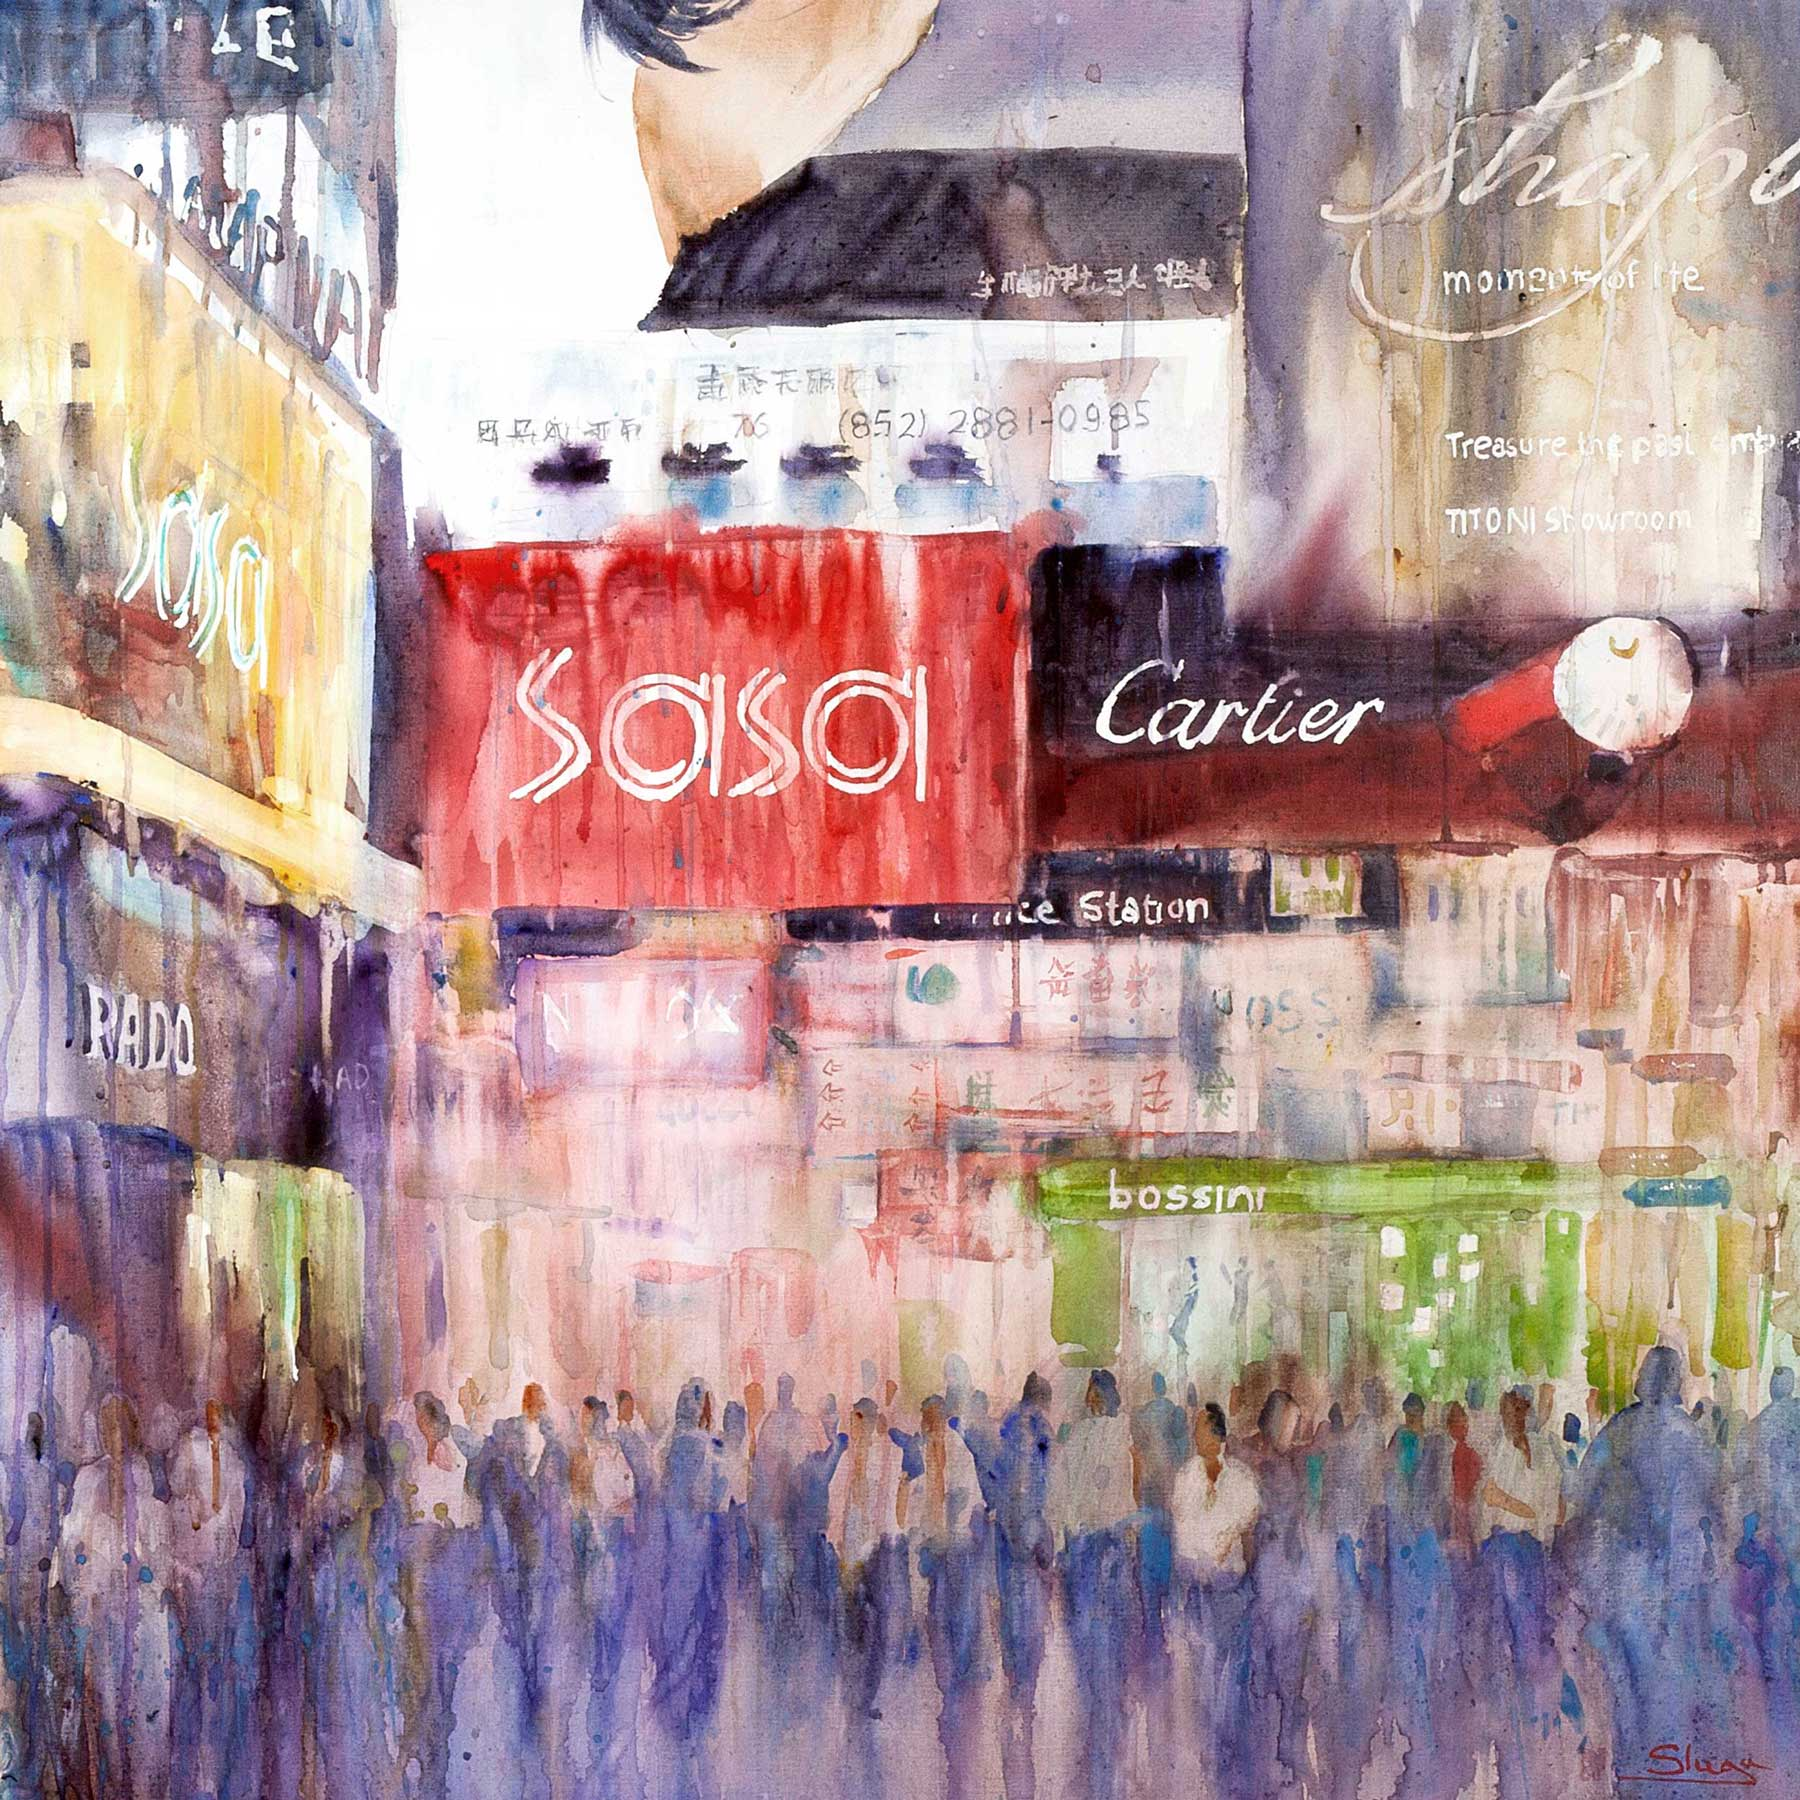 Sasa and Cartier 91 x 91 cm